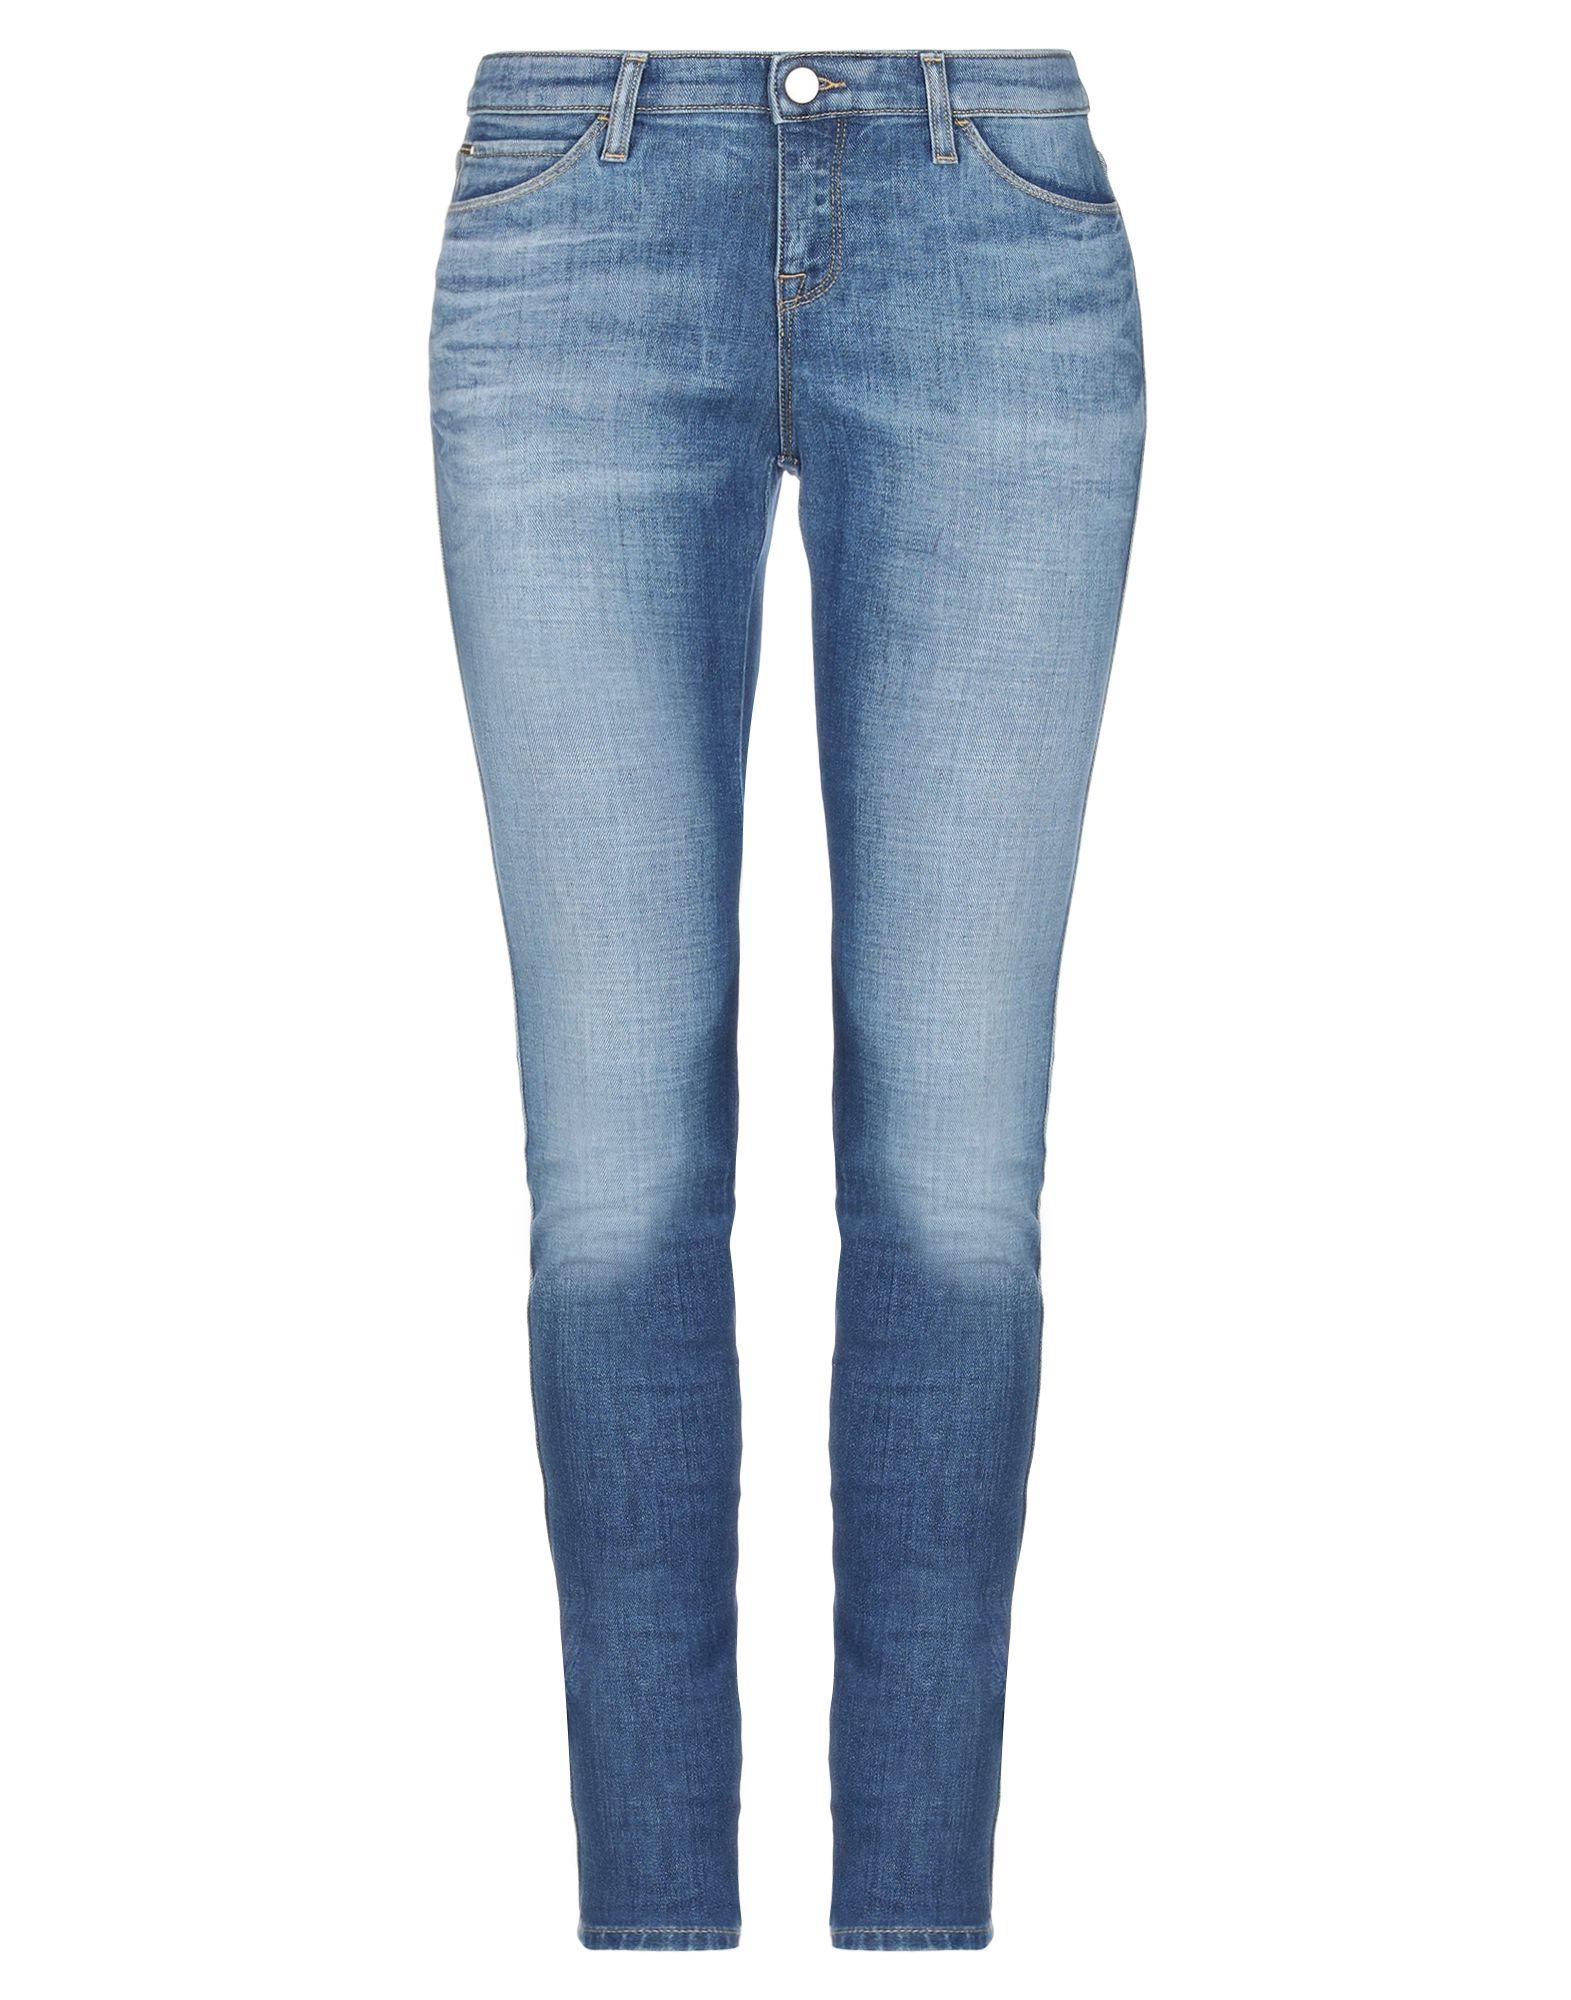 Pantaloni Jeans Armani Armani Armani Jeans donna - 42654455PN f0c